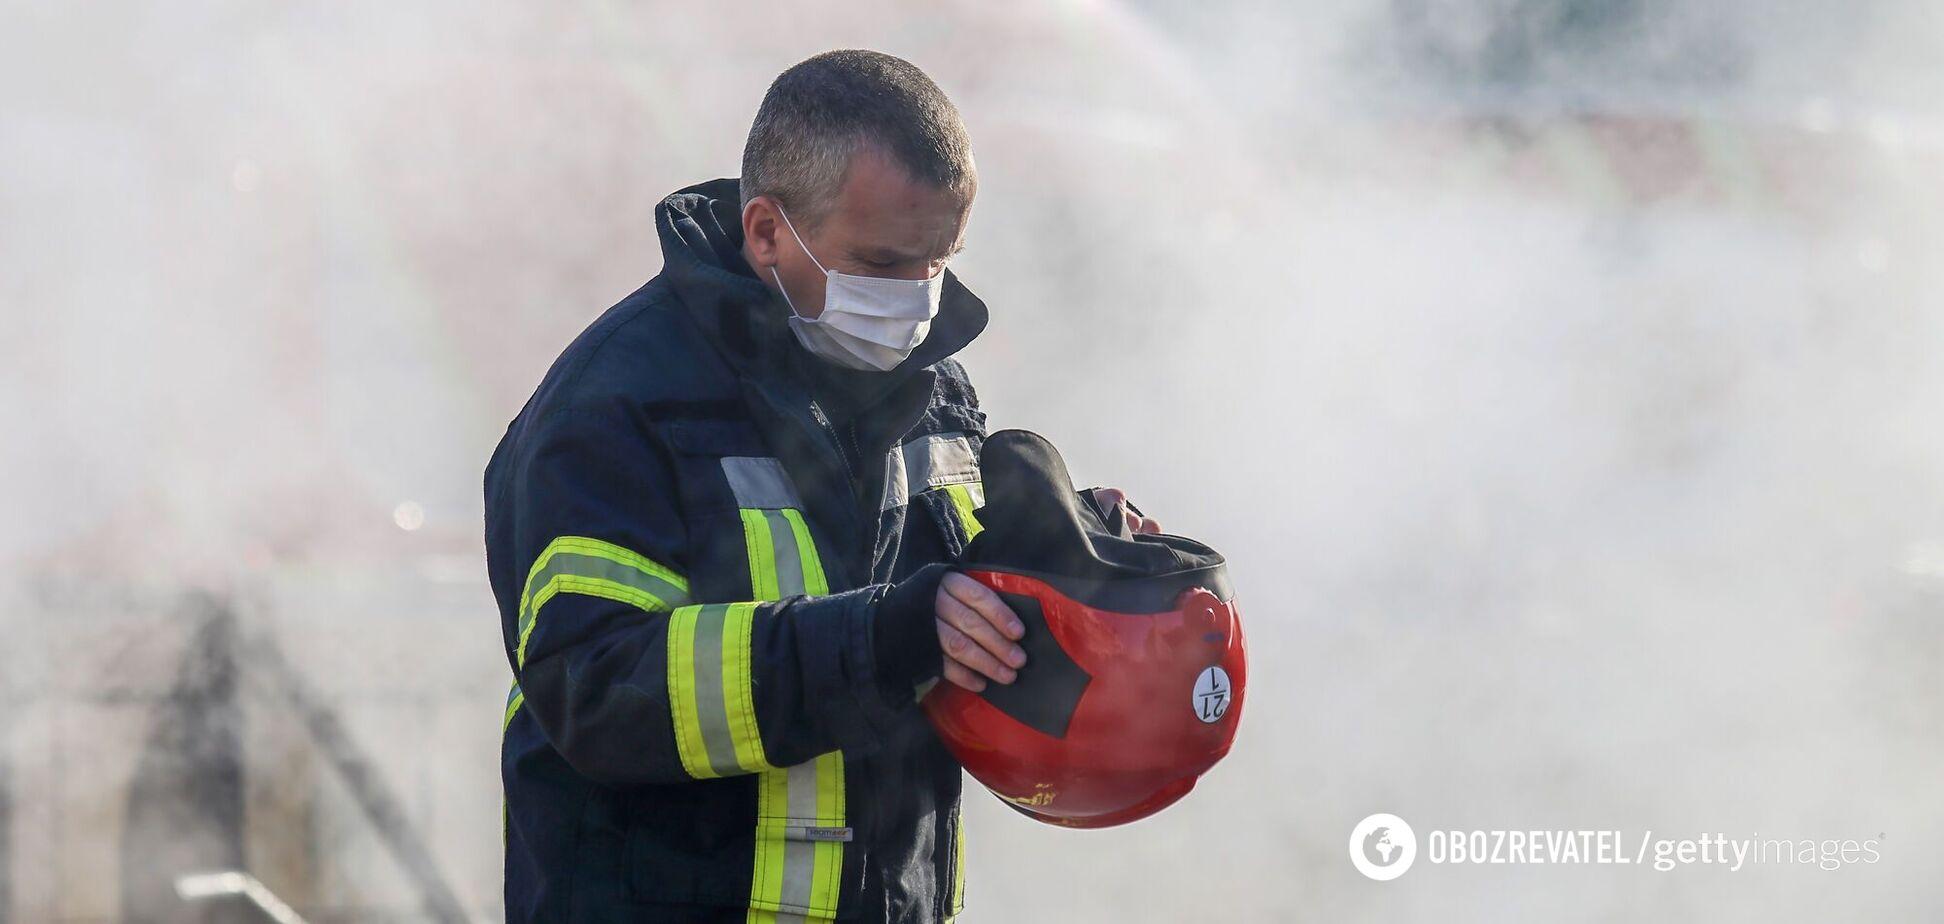 Пожежники загасили загоряння в будинку потерпілого